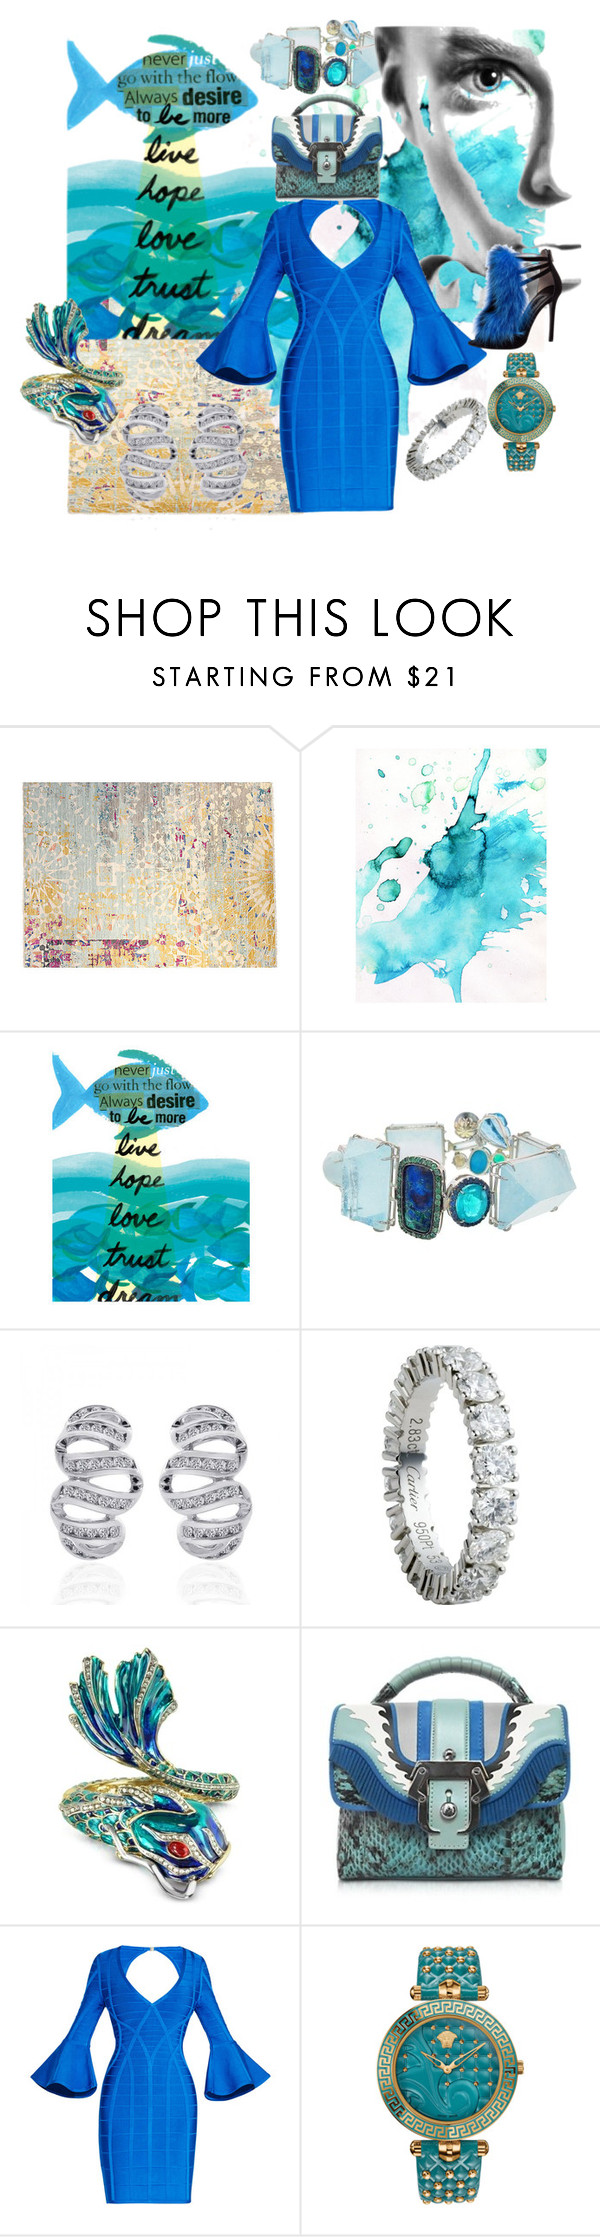 """Ebb and Flow"" by successisbella ❤ liked on Polyvore featuring F.J. Kashanian, Sharon Khazzam, Cartier, Roberto Cavalli, Paula Cademartori, Hervé Léger, Alberto Guardiani and Versace"